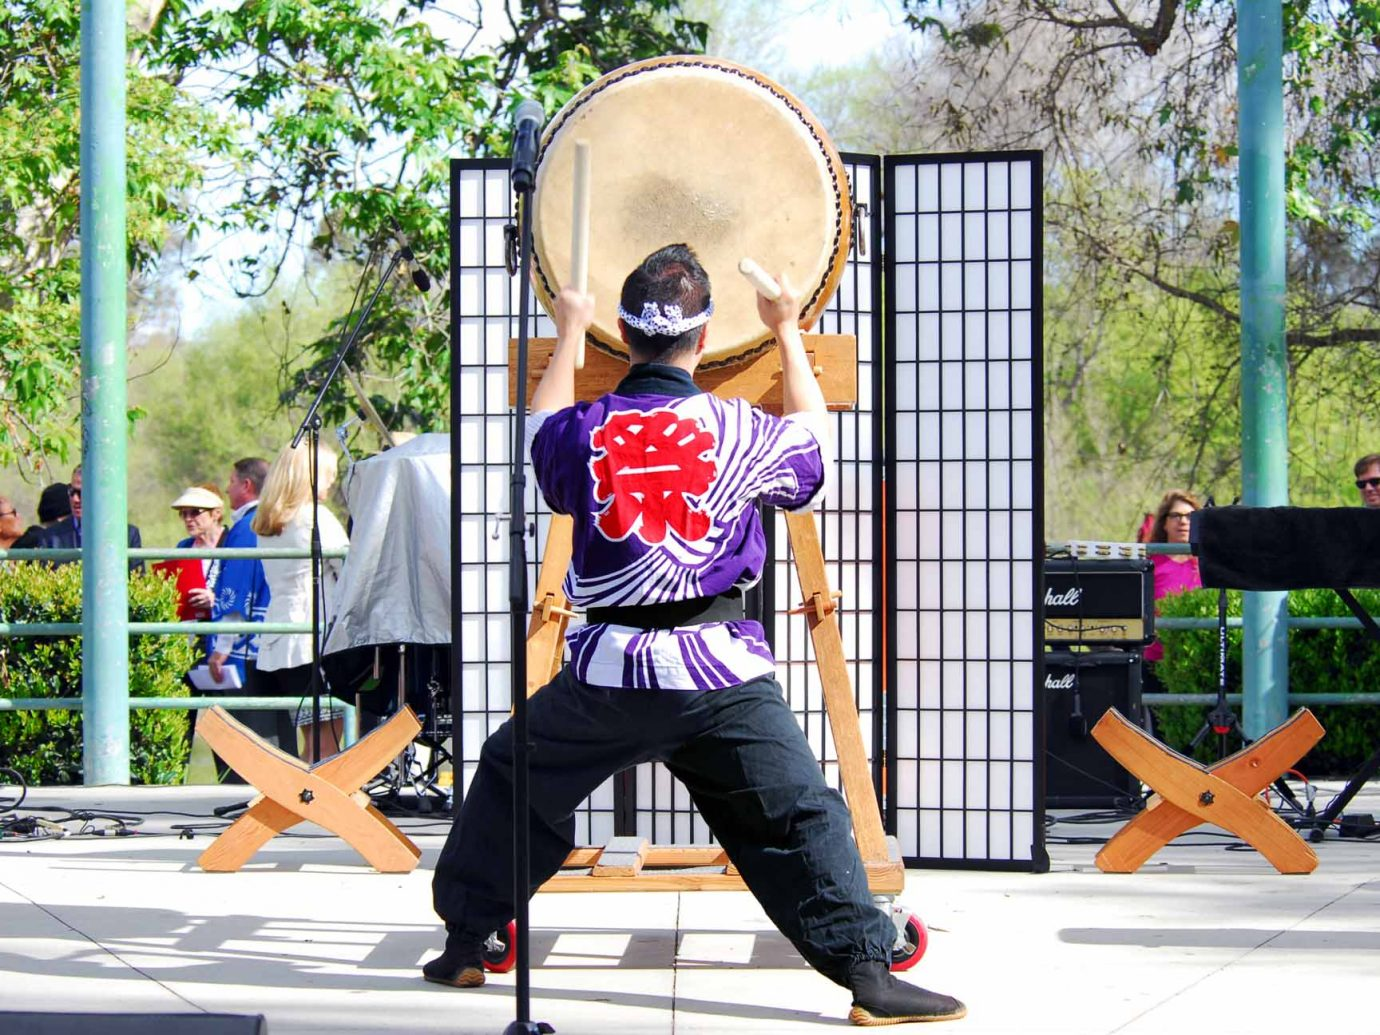 Performer at Orange County Cherry Blossom Festival